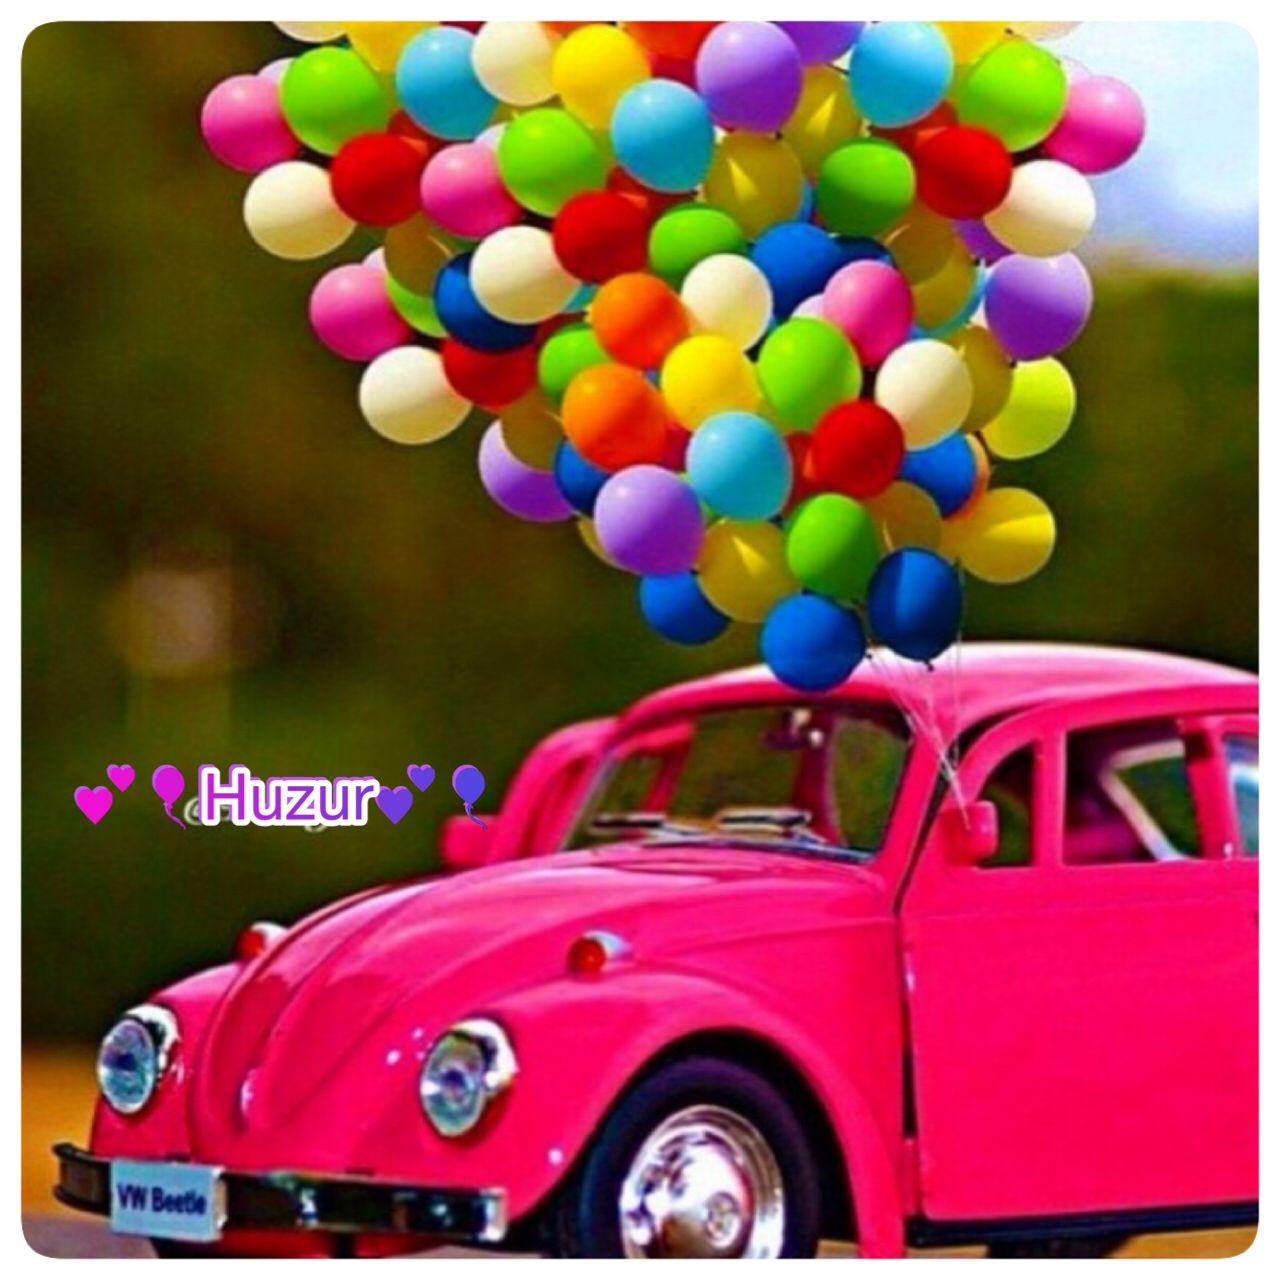 fafea01ce46e18fb8d86329ea7280928 pin by ~allah İÇİn~ on güzel pinterest happy birthday memes